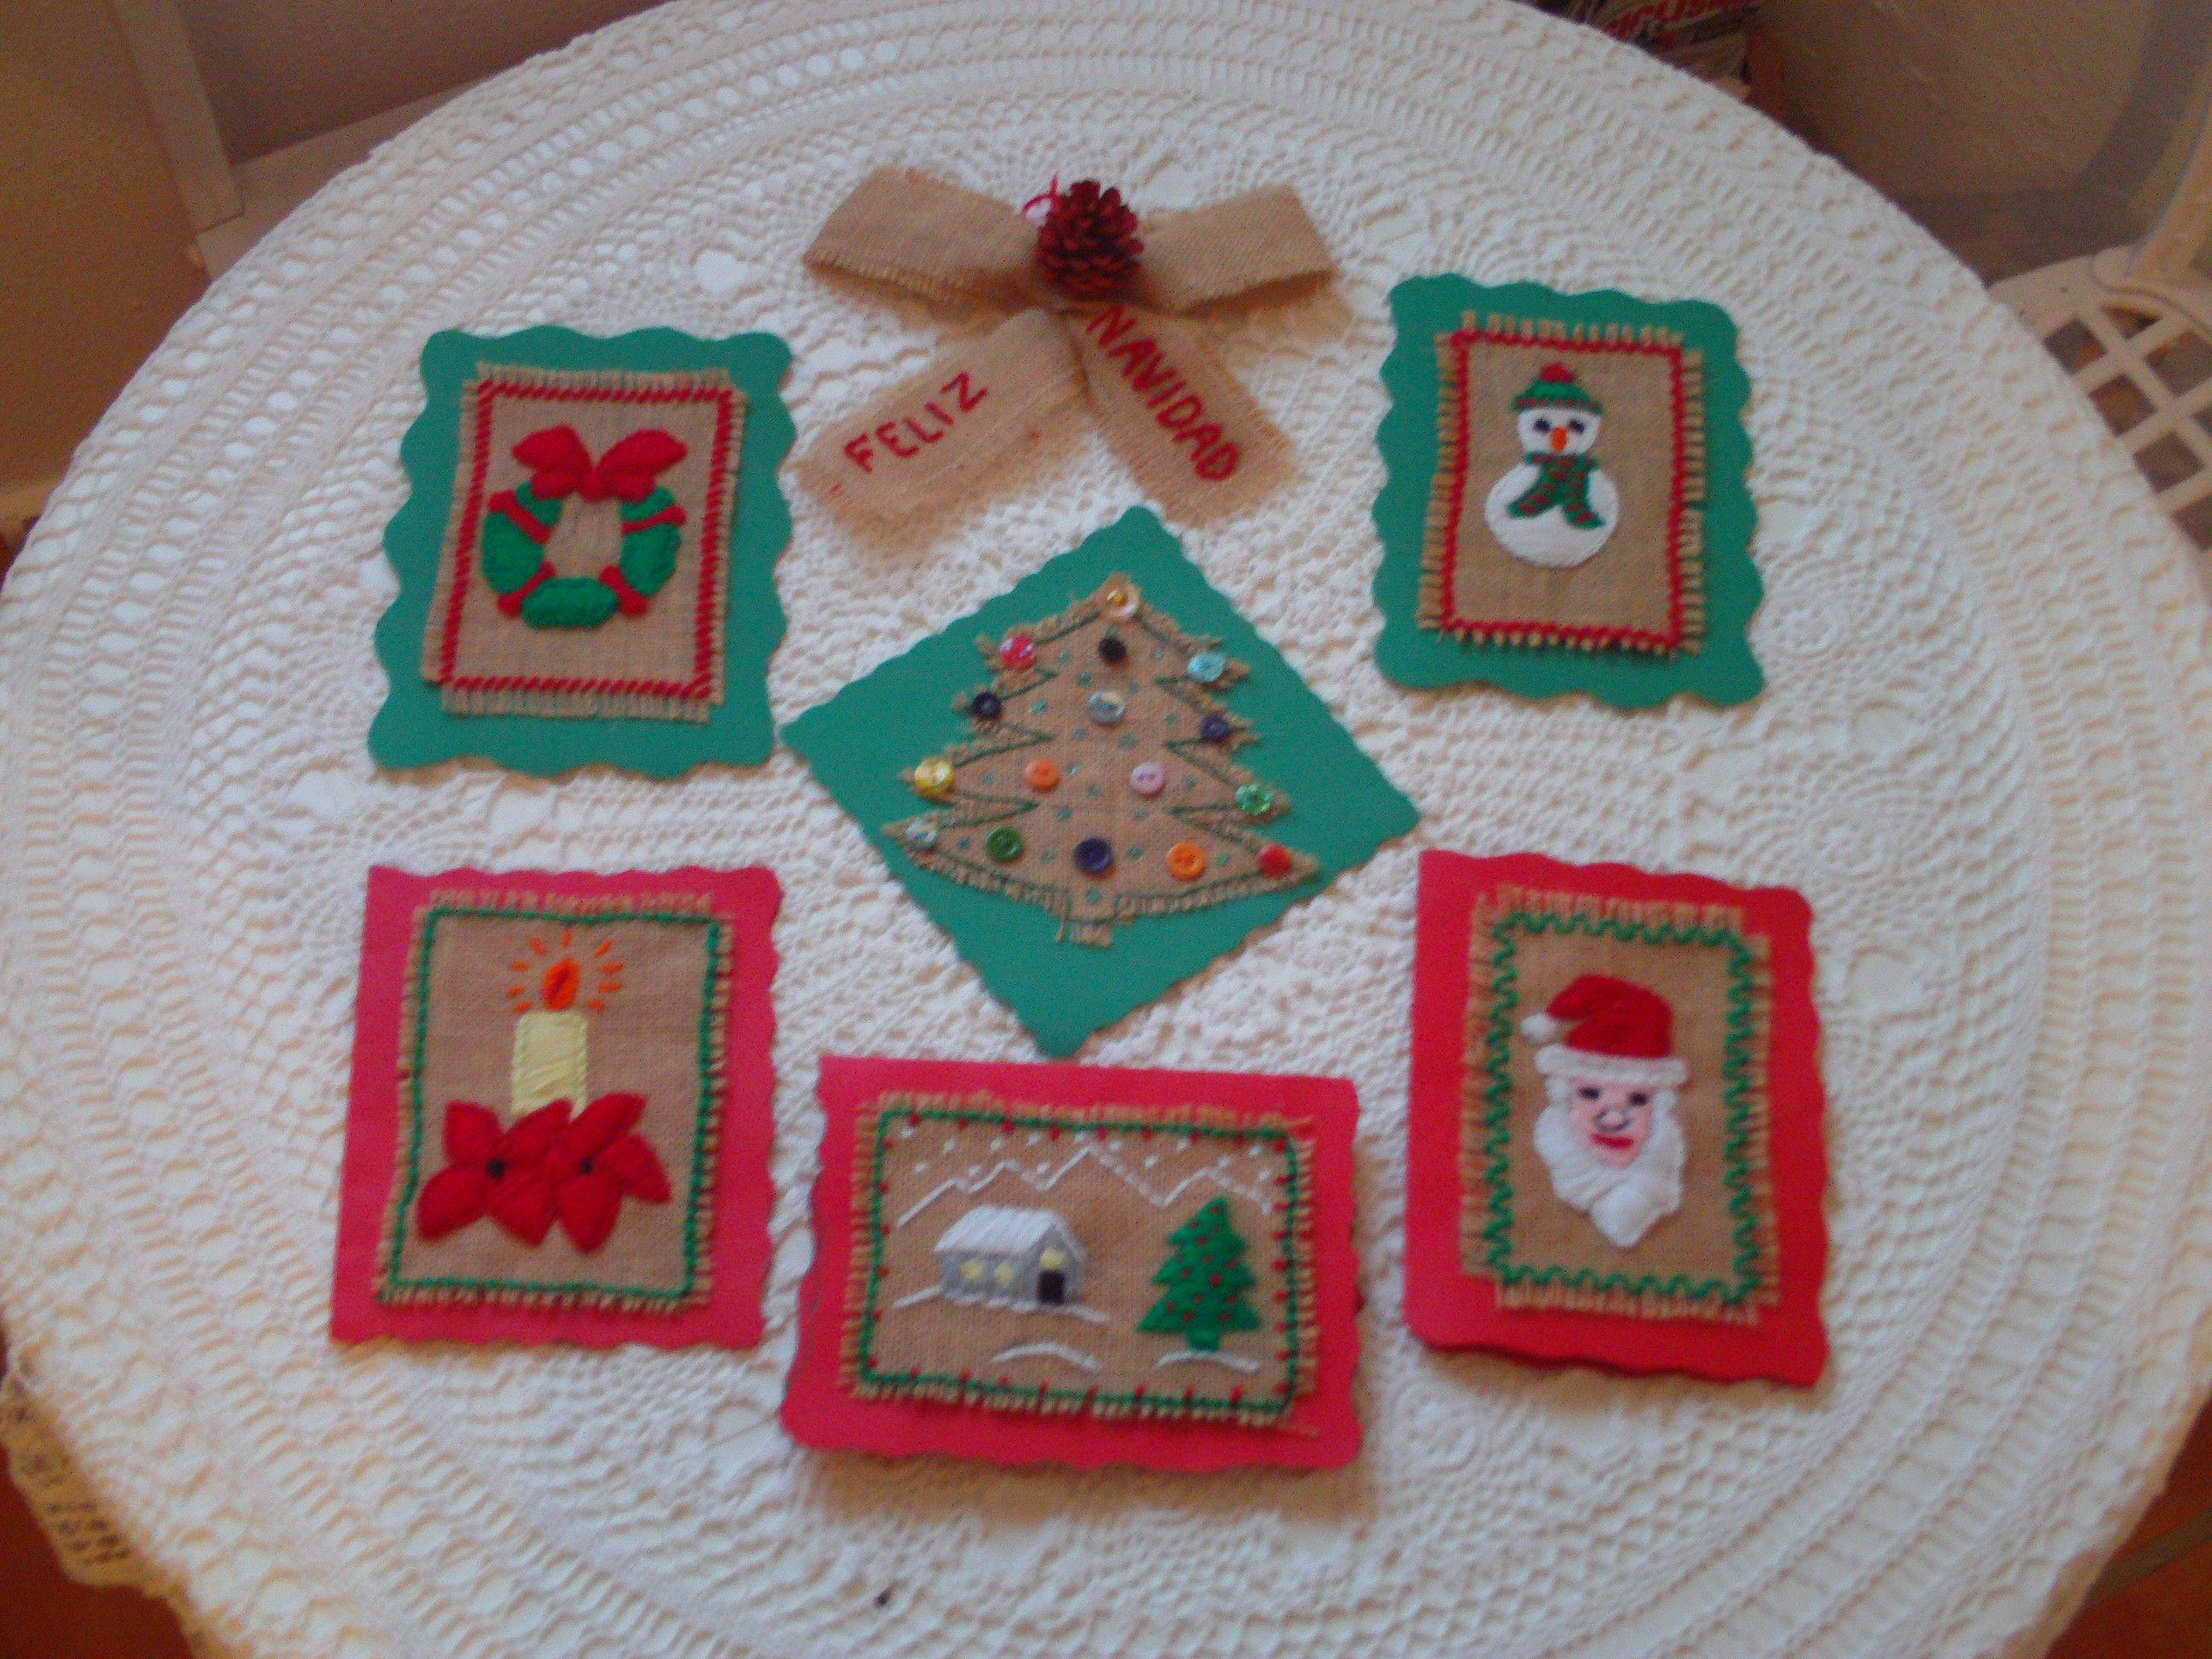 Tarjetas de navidad hechas a mano con tela de saco - Tela de saco ...